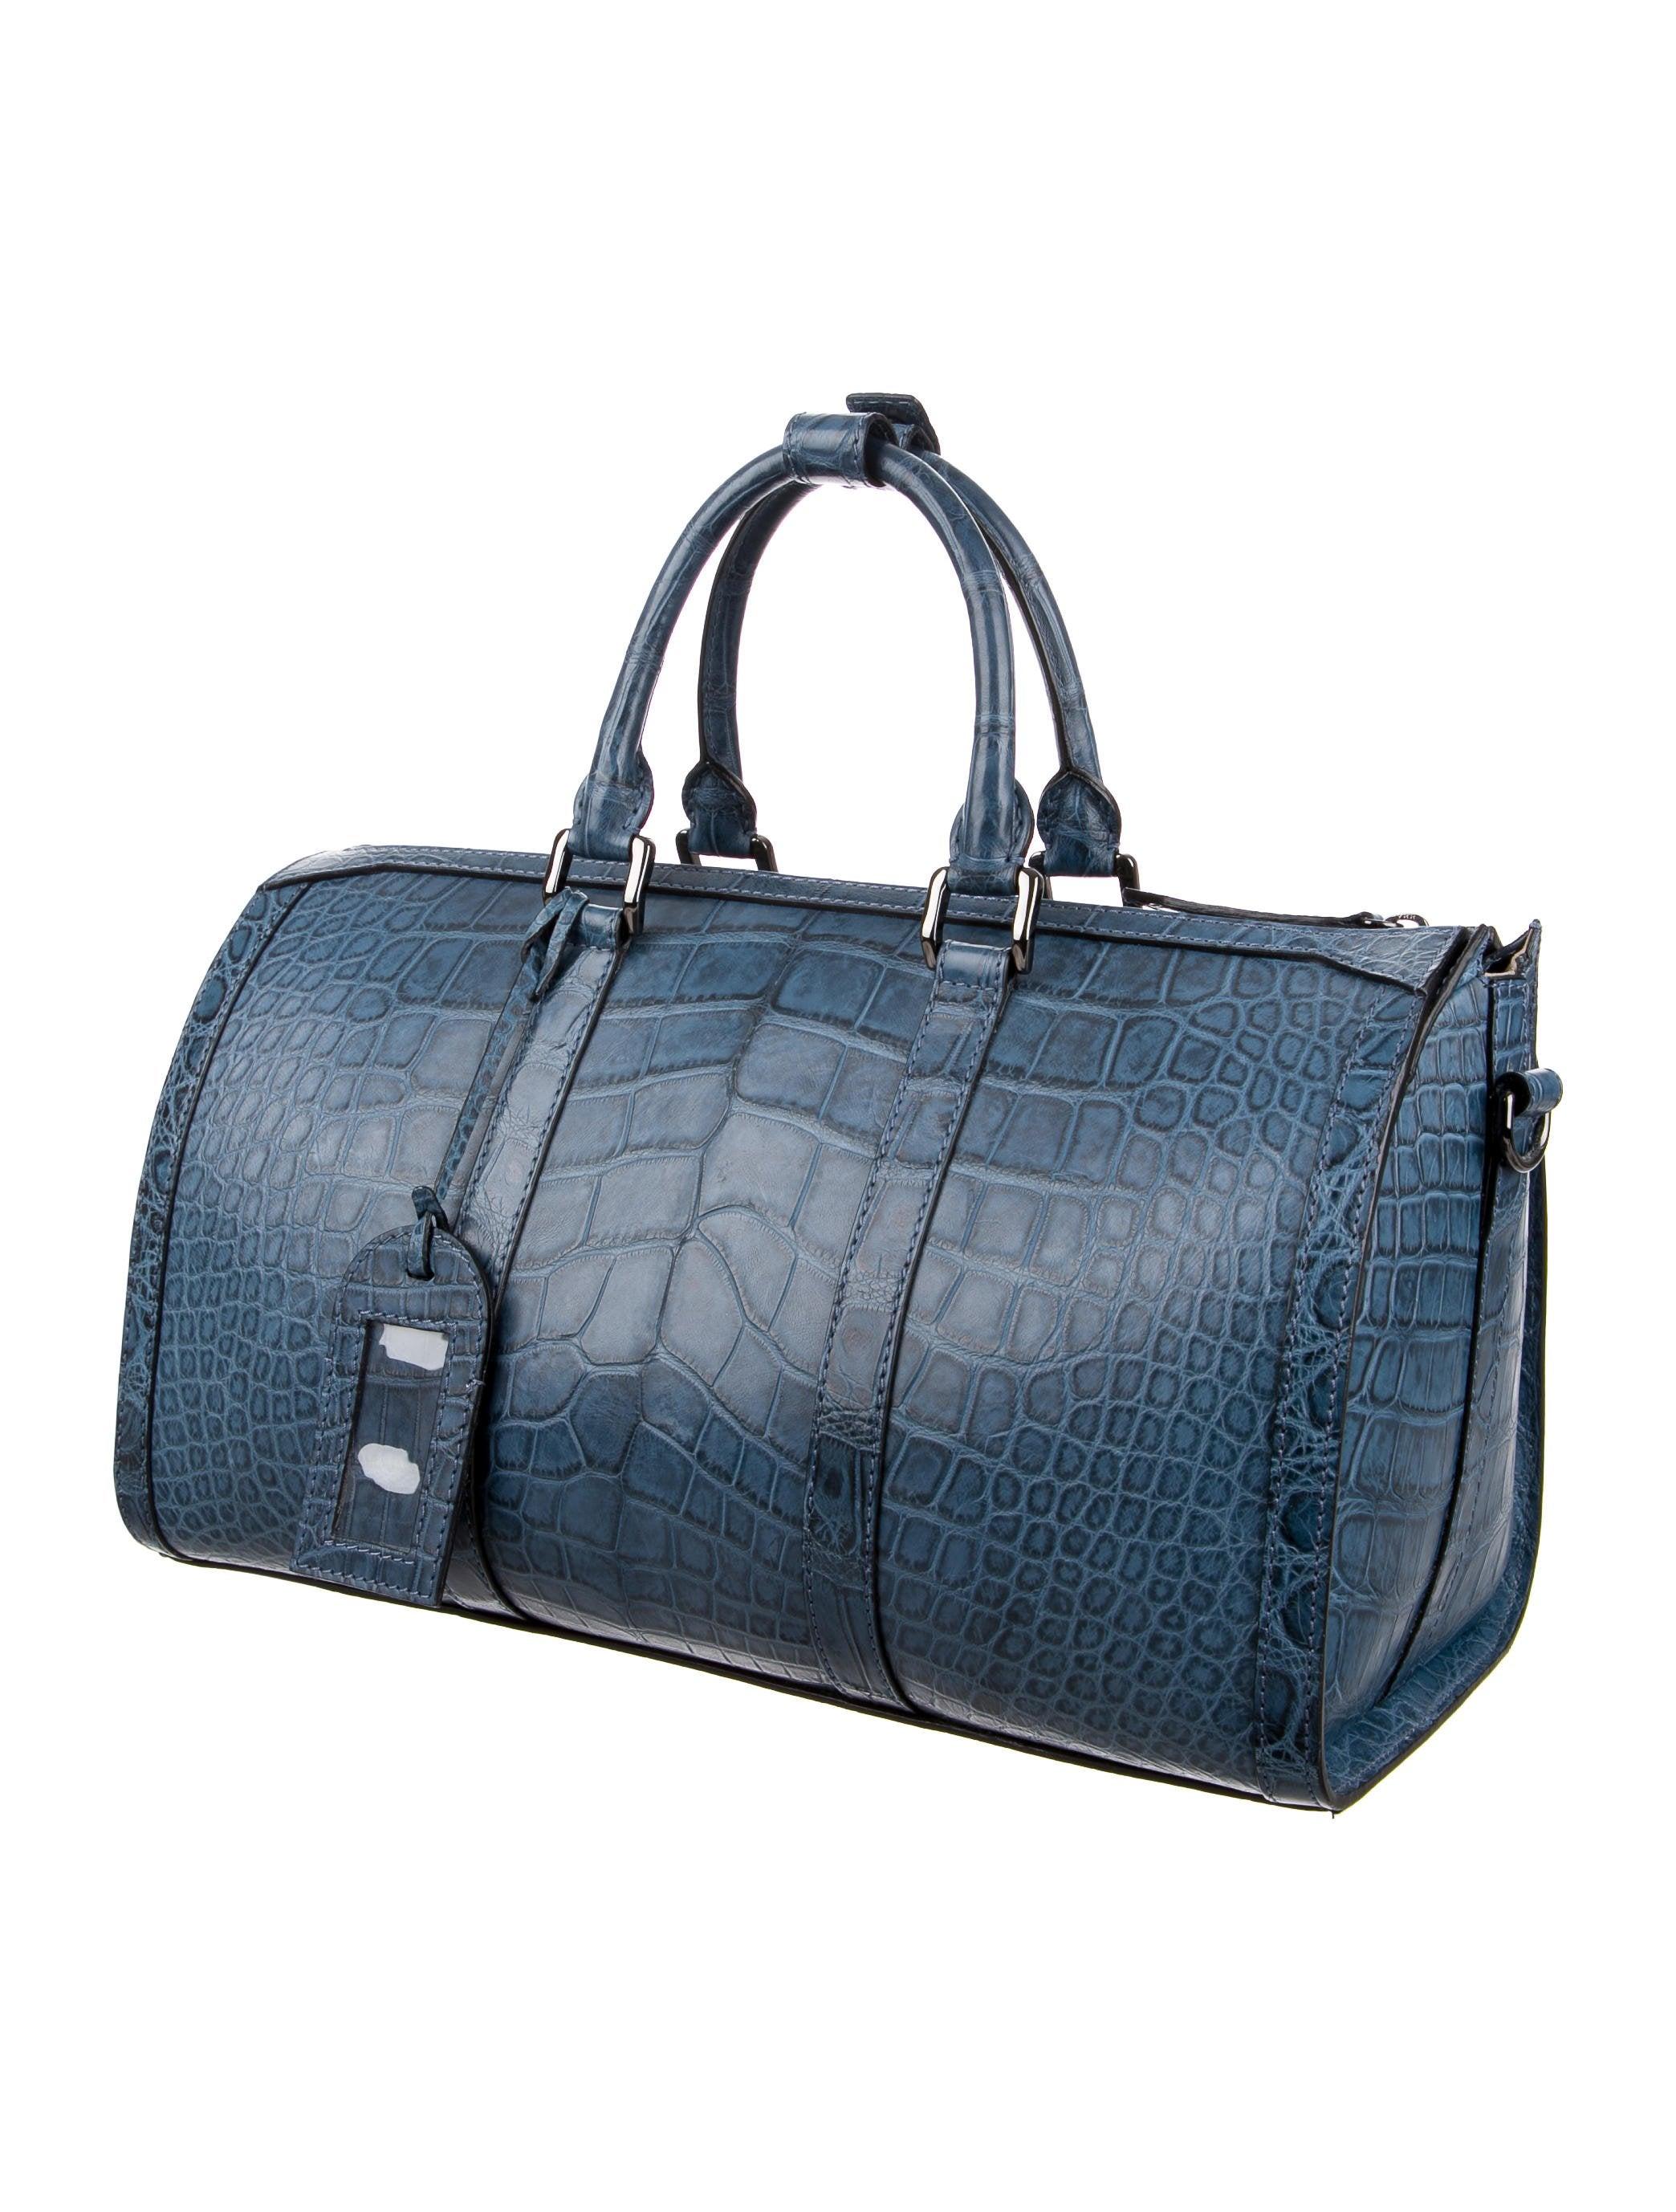 Burberry Ltd Ed Blue Alligator Travel Weekend Large Duffle Bag at 1stdibs 32775abd03